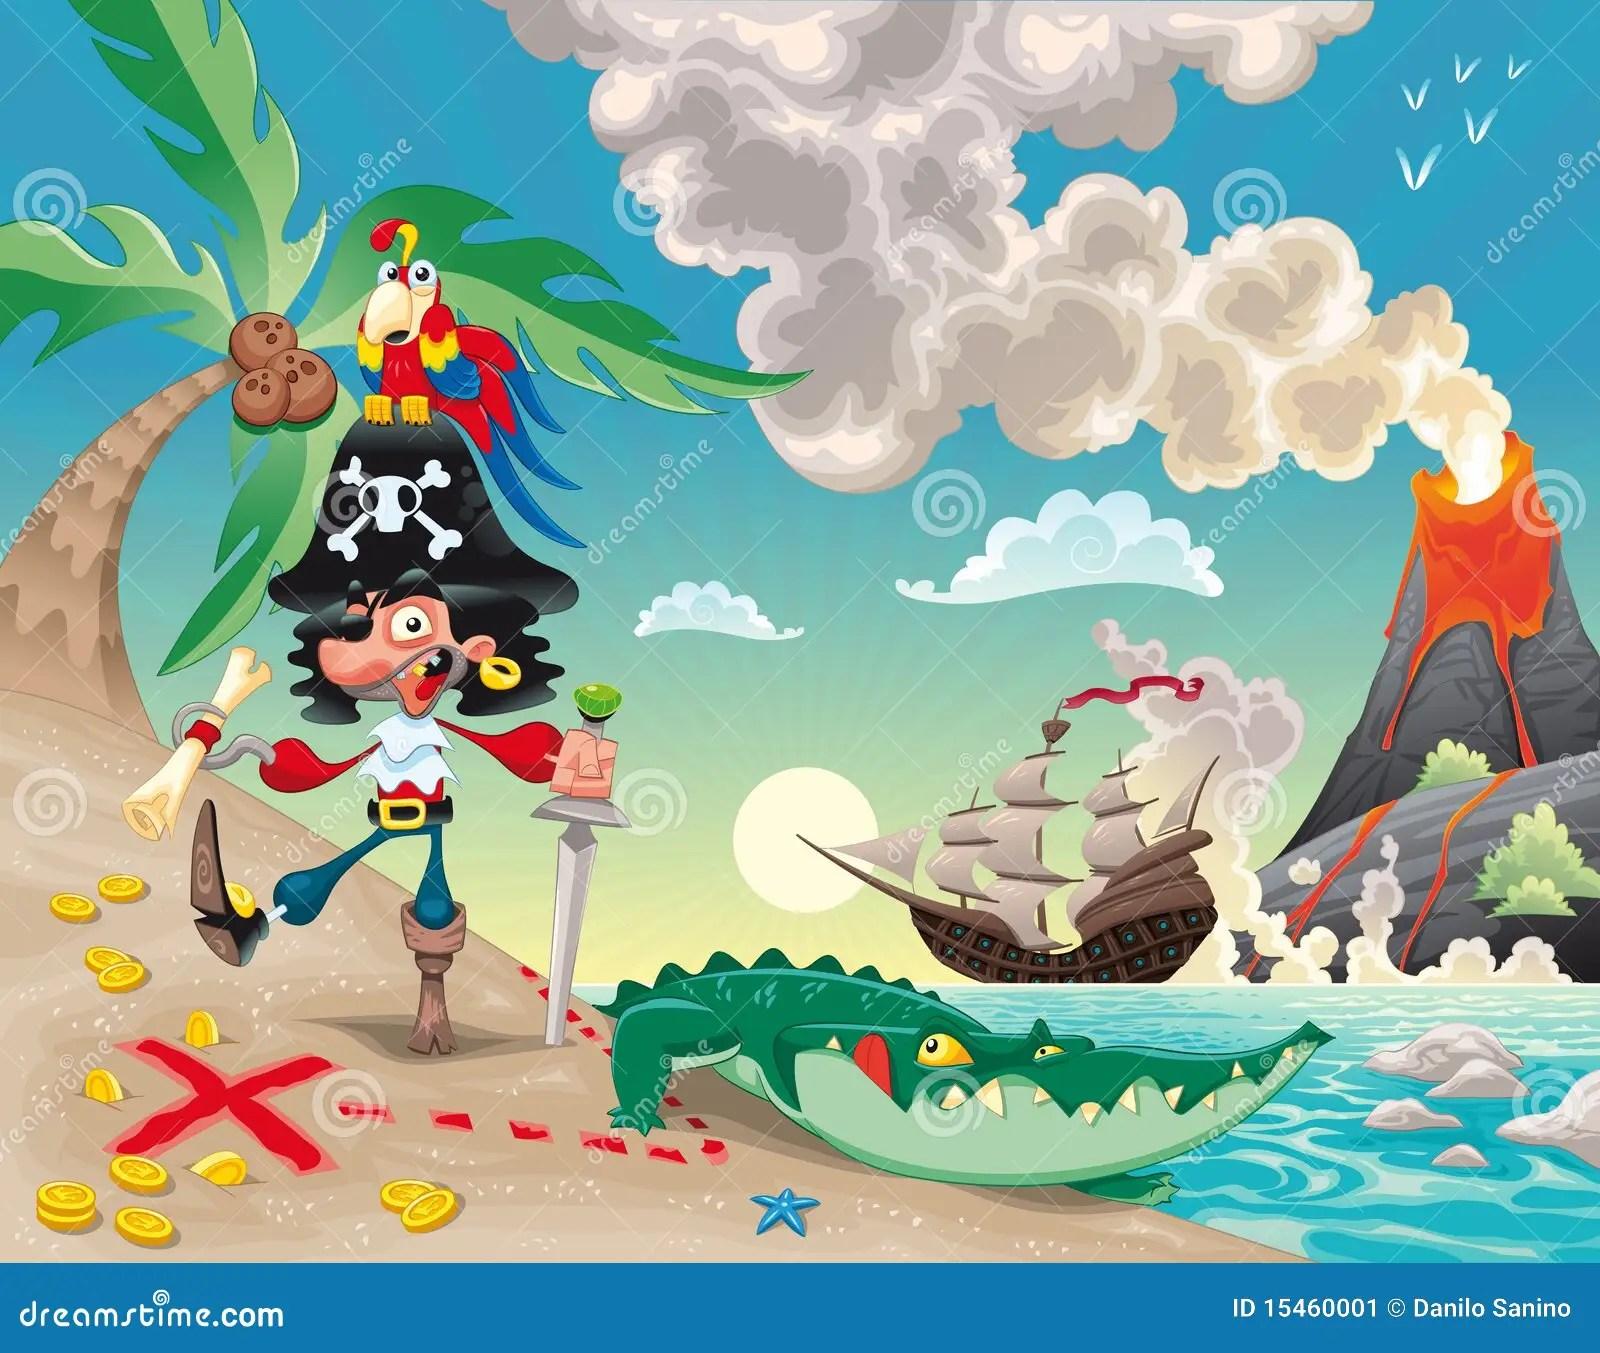 Cute Boy Cartoon Wallpaper Pirate On The Island Stock Vector Illustration Of Cute